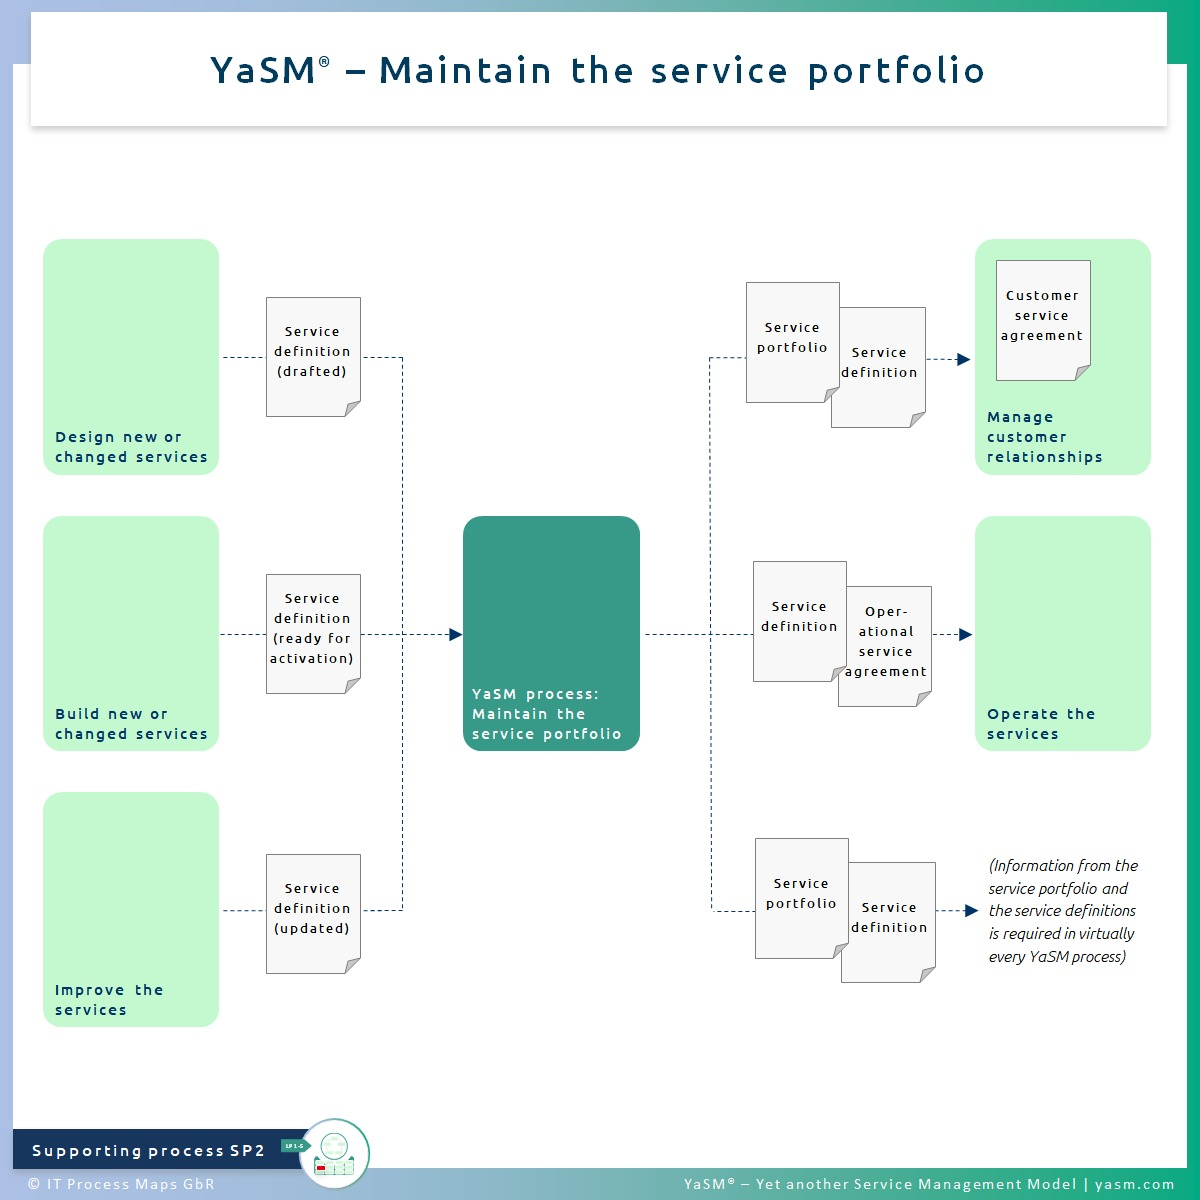 Fig. 1: Maintain the service portfolio. - YaSM portfolio maintenance process SP2.